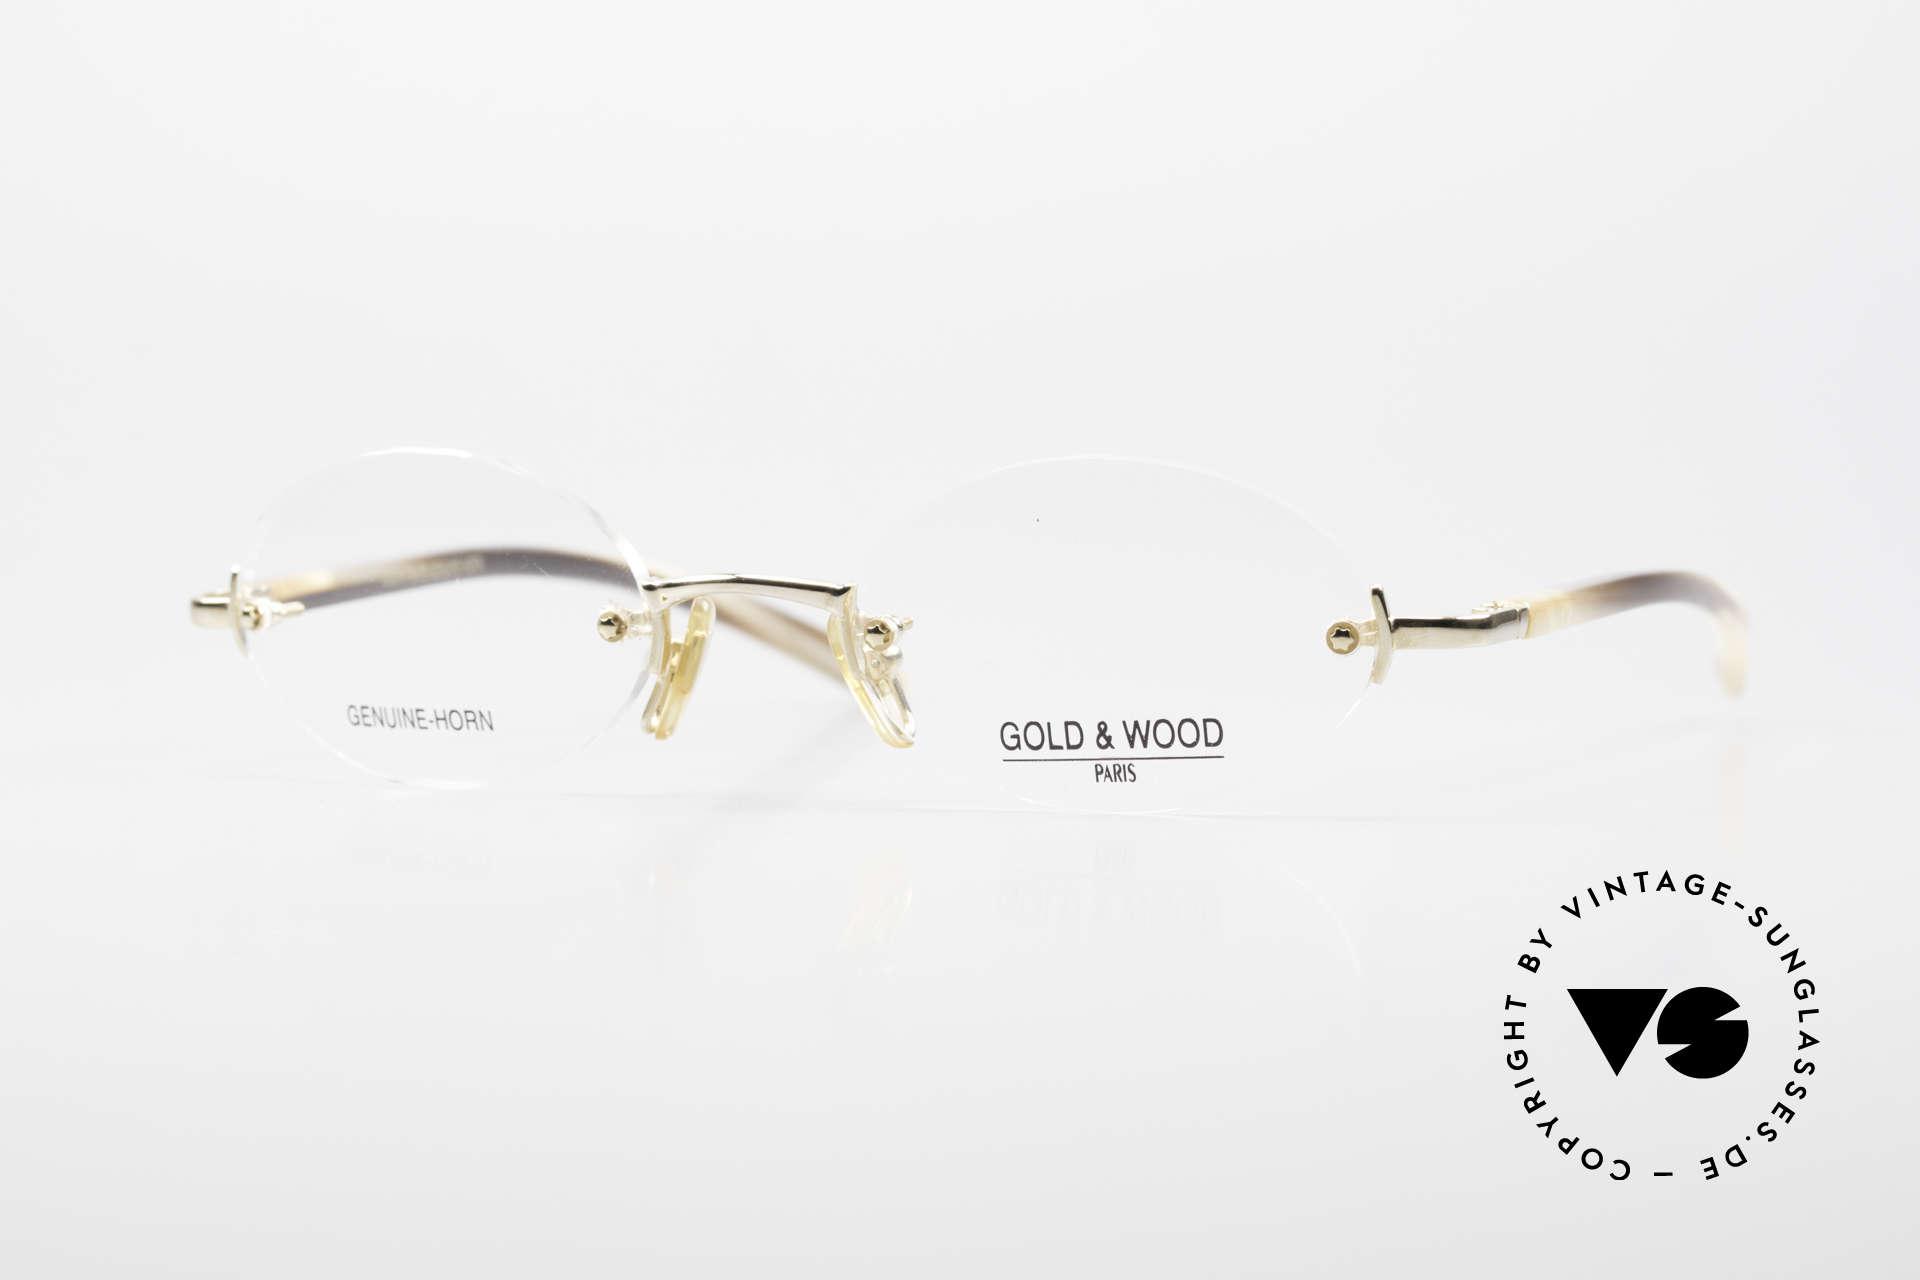 Gold & Wood 331 Rimless Genuine Horn Glasses, Gold & Wood Paris glasses, 331-06, genuine horn, Made for Men and Women